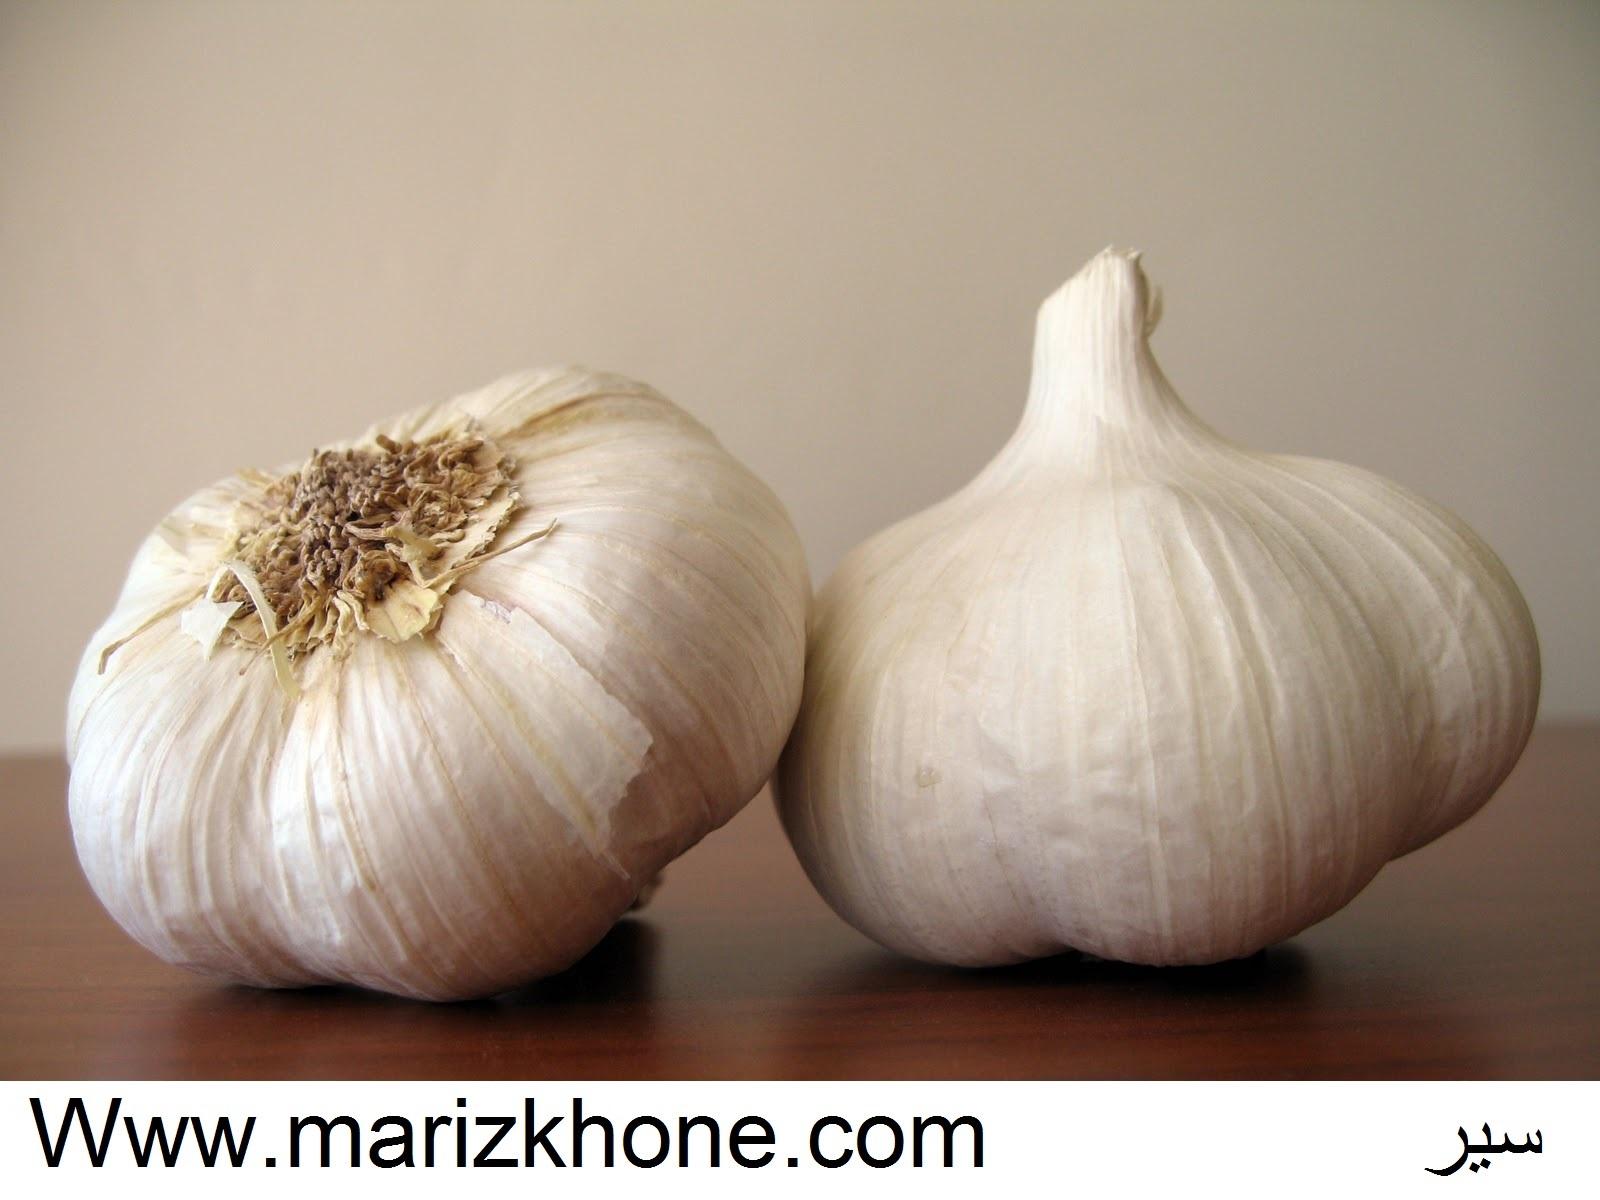 سیر،liliaceae،Allium sativum L،Garlic،Www.marizkhone.com،وبسایت تخصصی اطلاعات پزشکی5